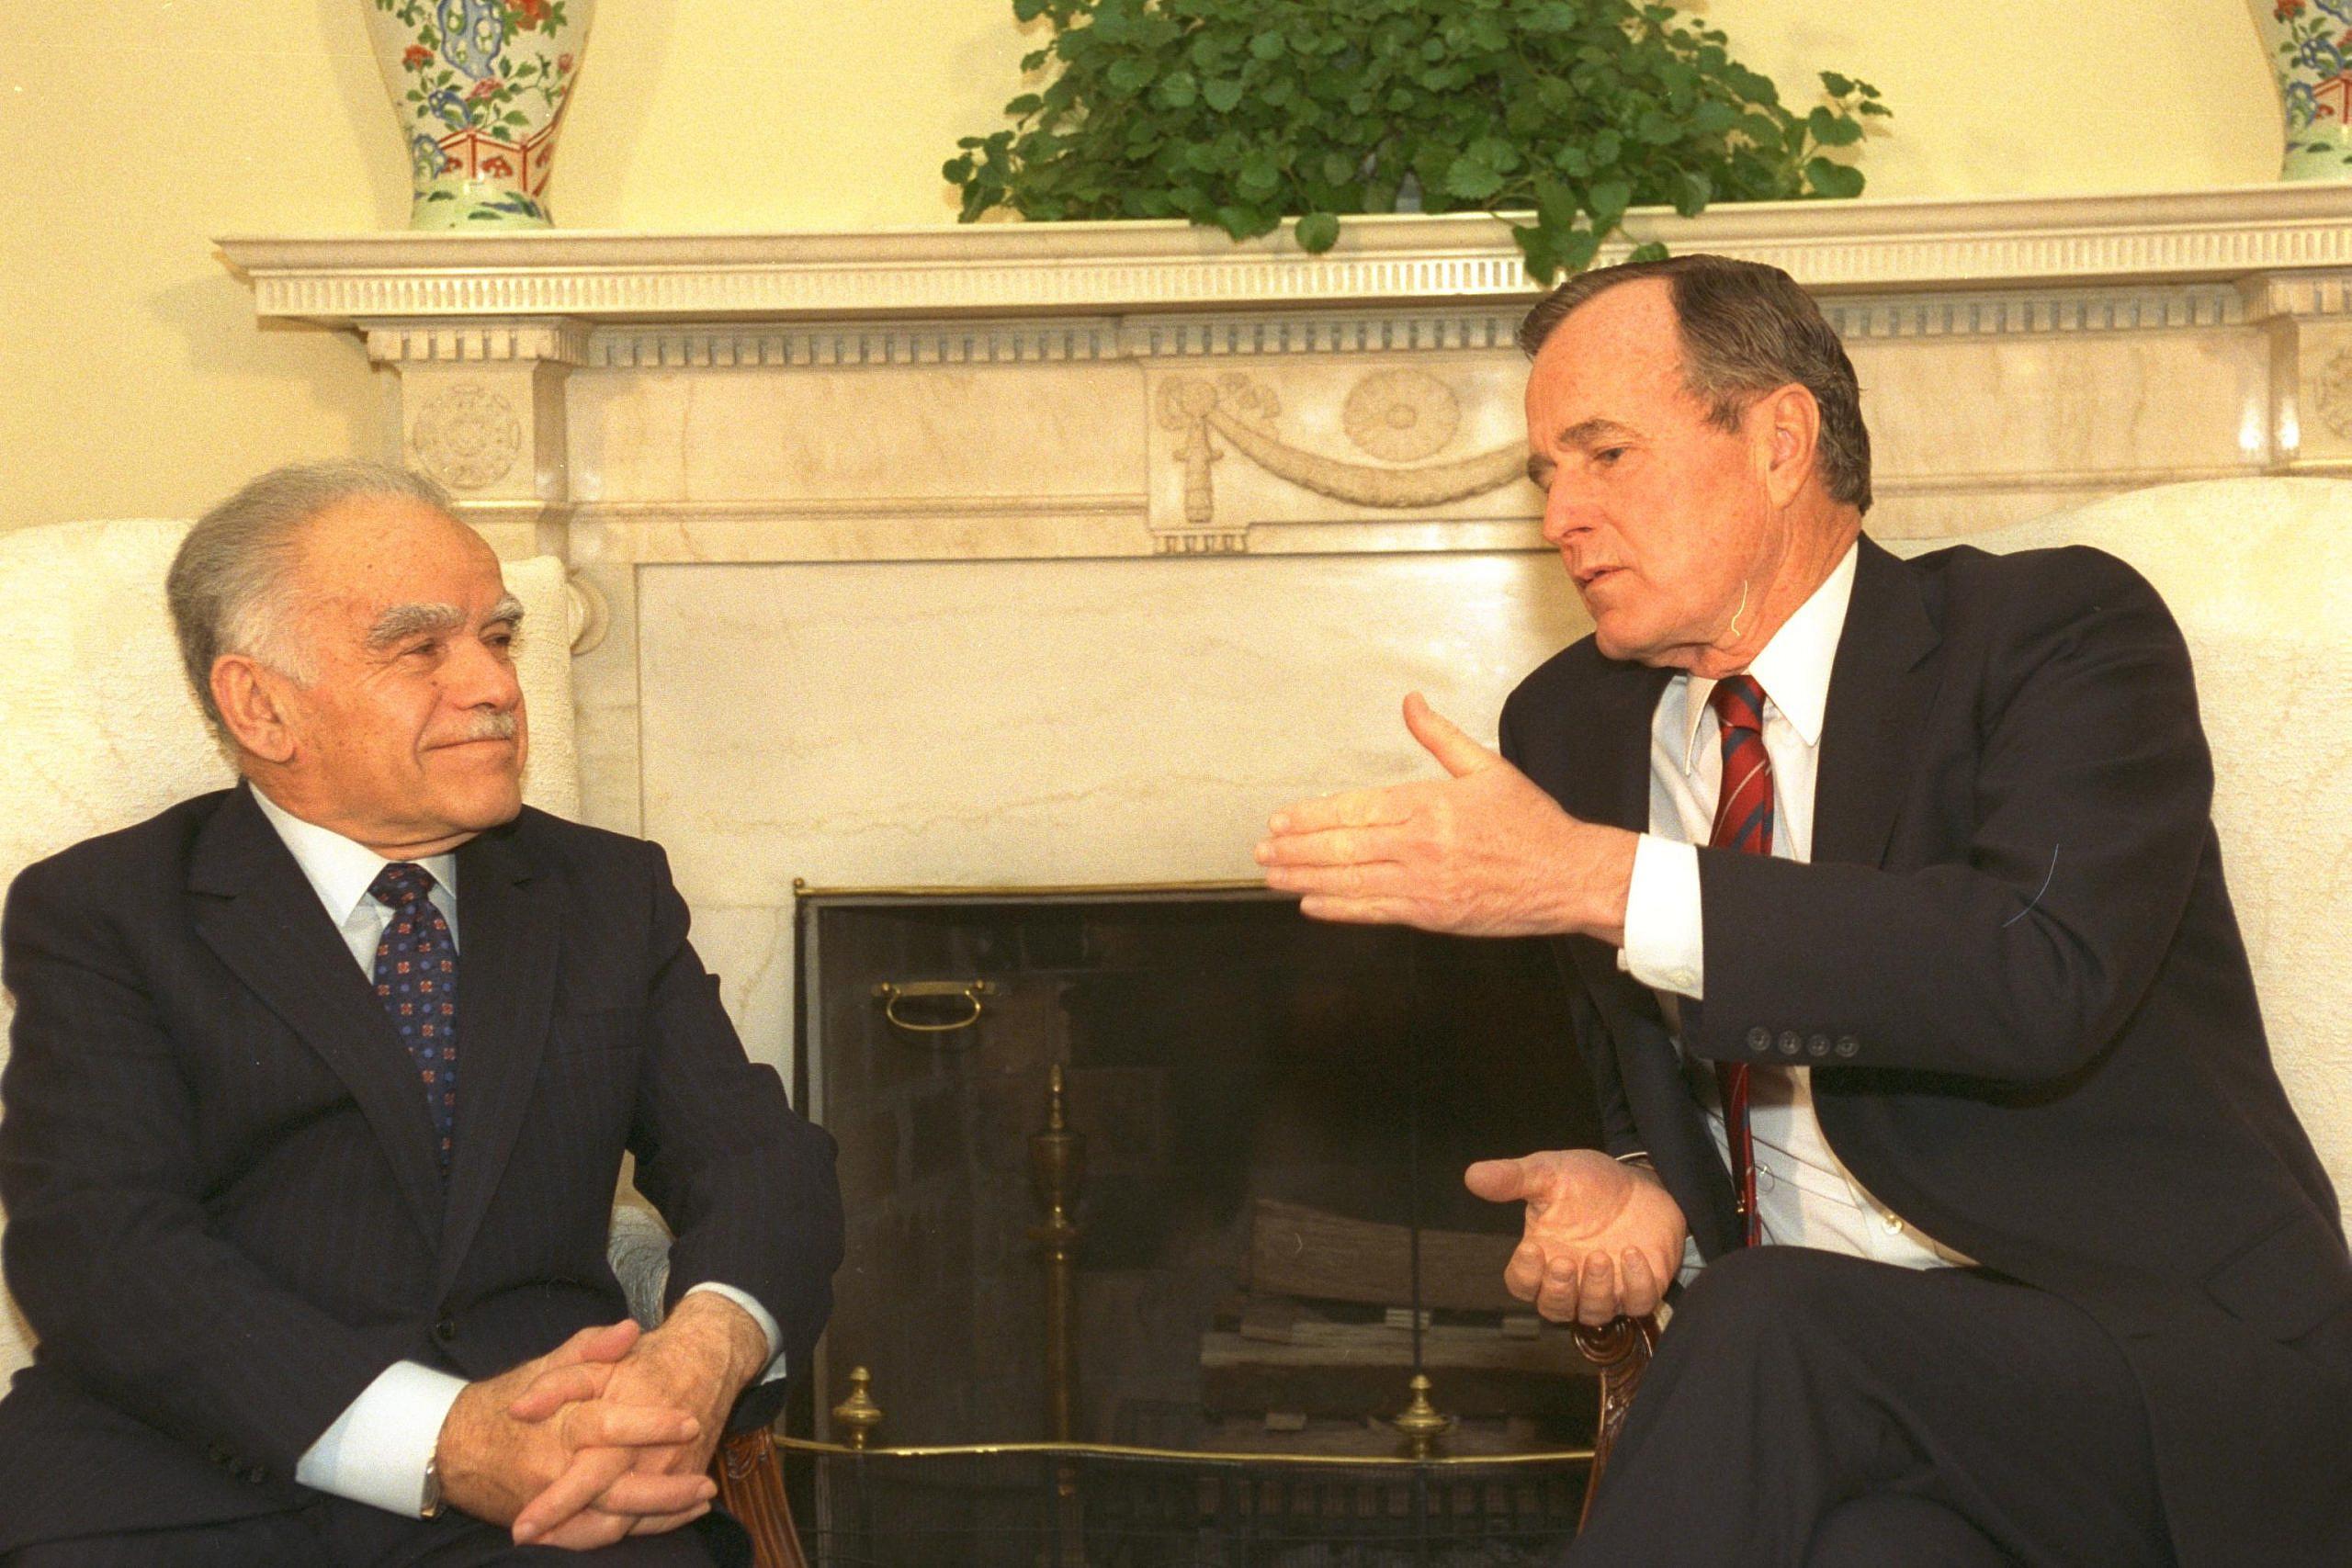 Israeli Prime Minister Yitzhak Shamir (left) and U.S. President George H.W. Bush meet in the Oval Office, White House, April 6, 1989. (Ya'acov Sa'ar)